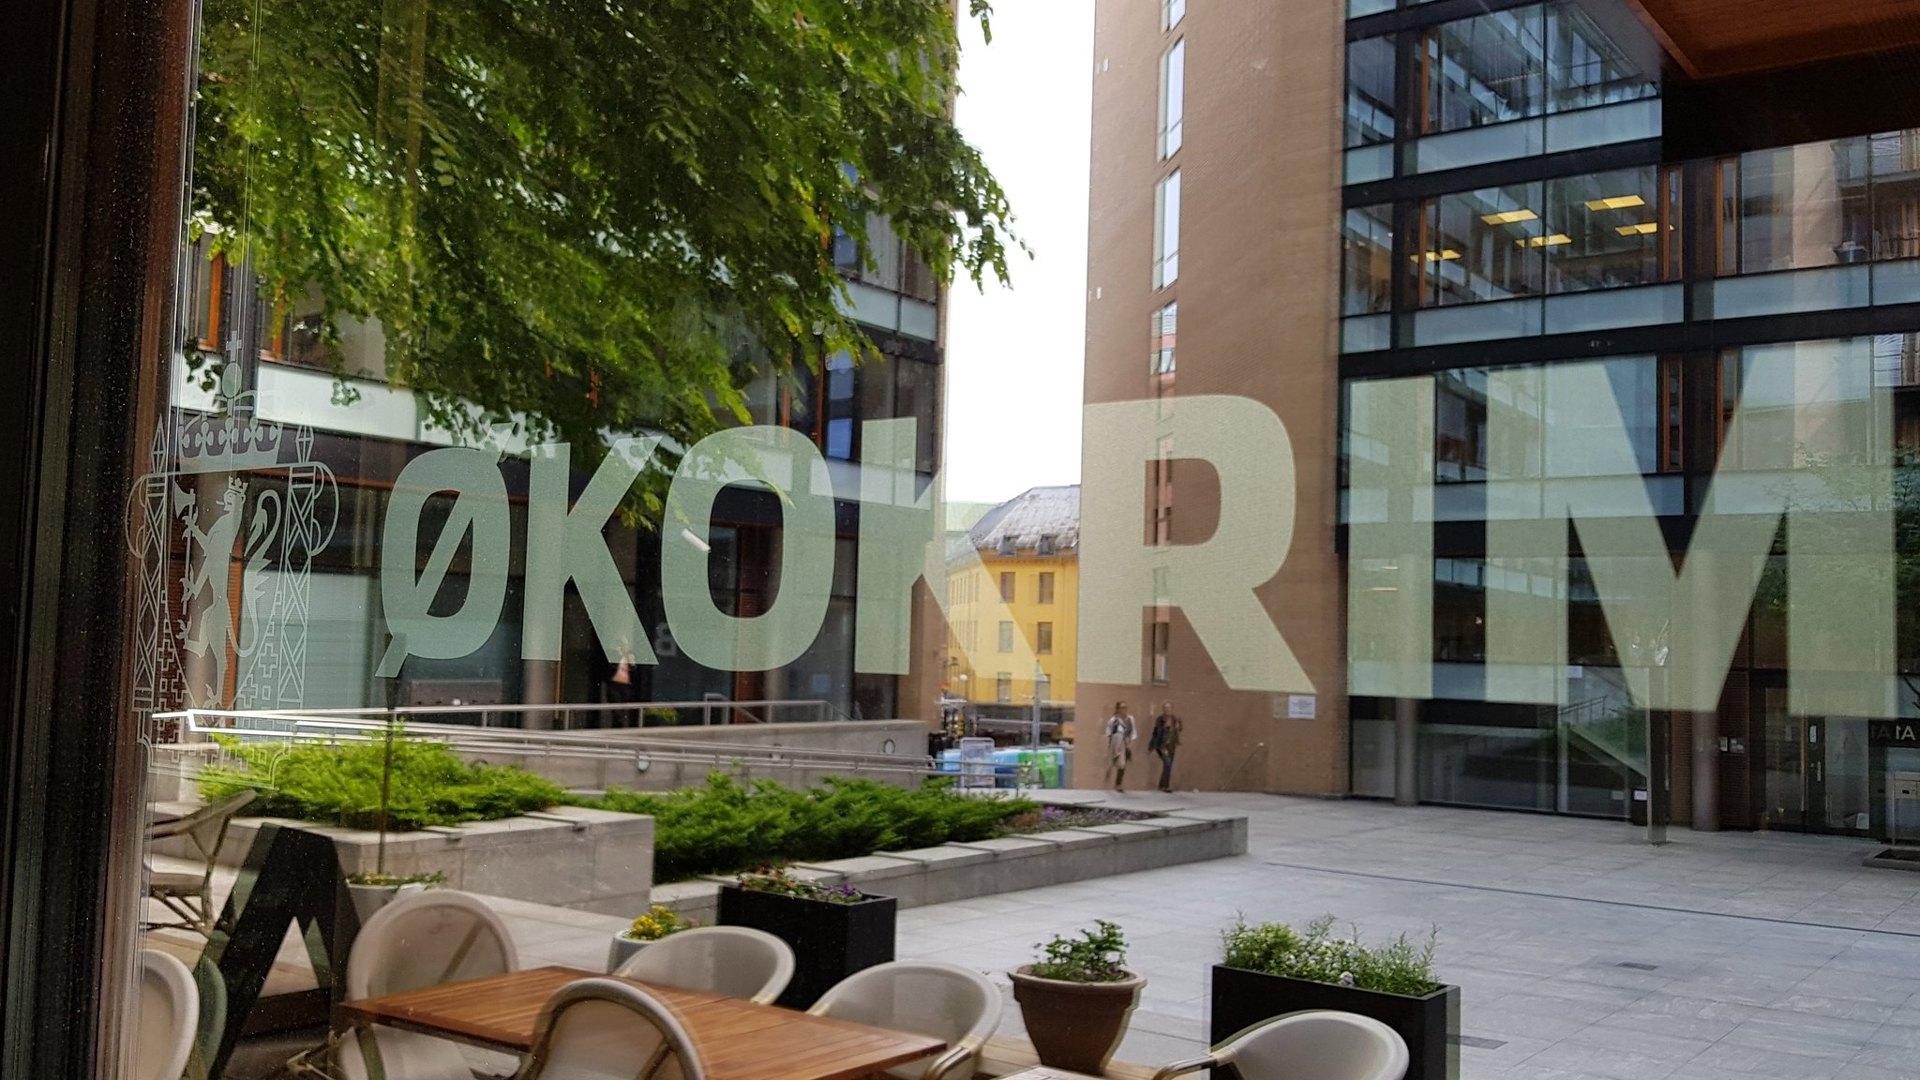 ØKOKRIM-logo